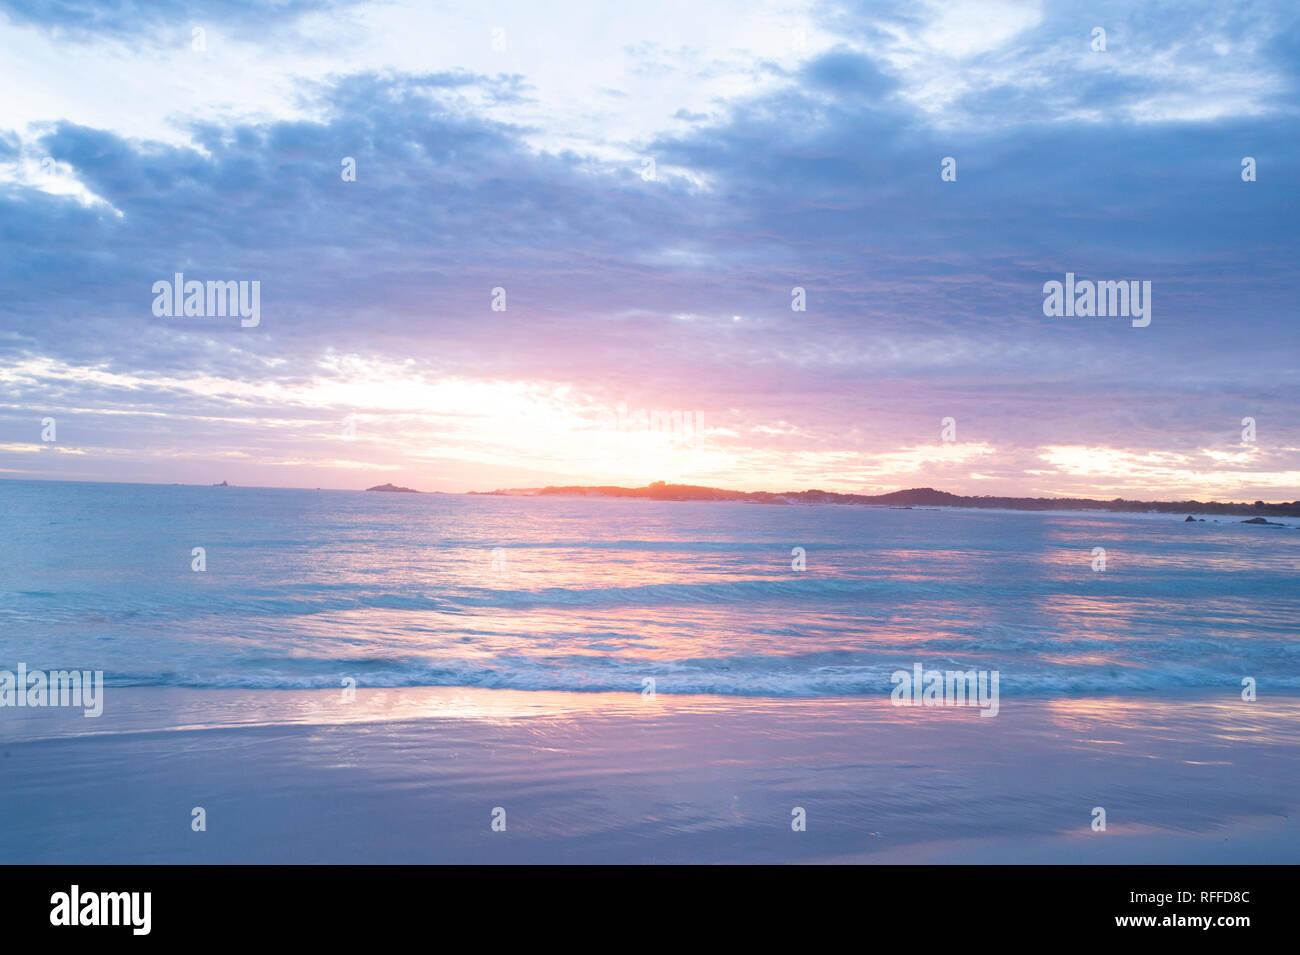 Bay of Fires, Tasmania, Australia - Stock Image